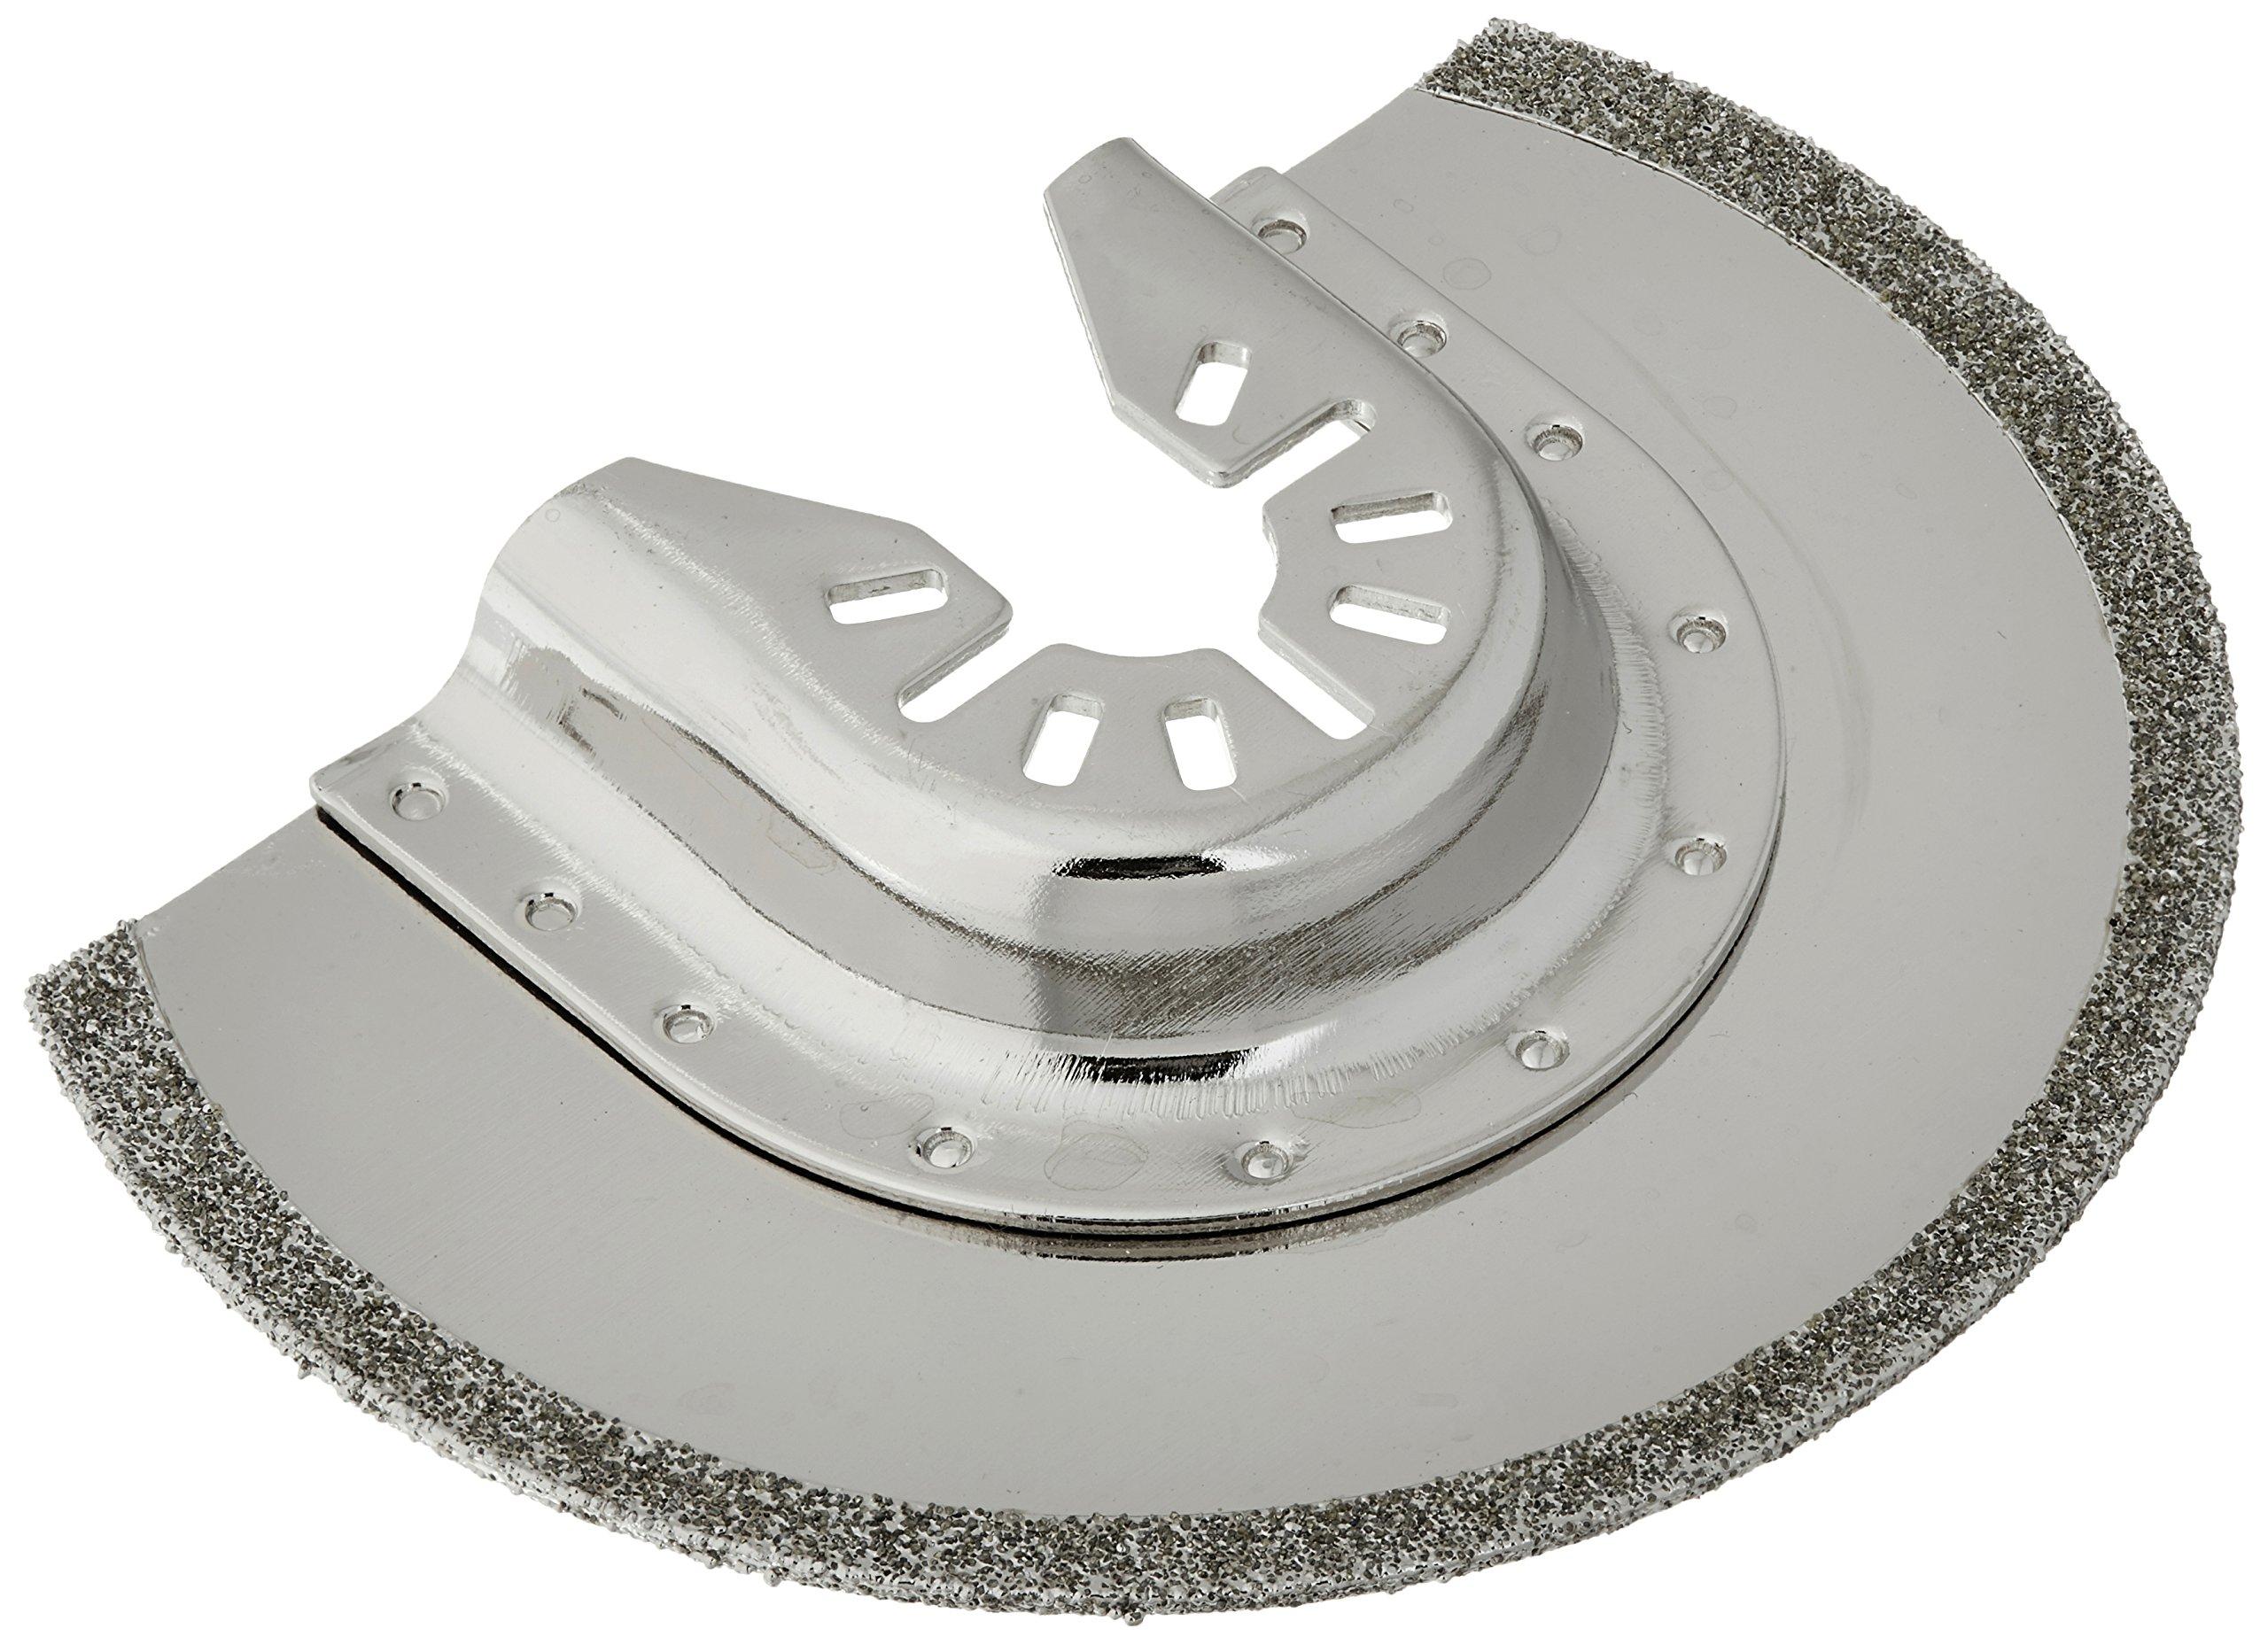 Dewalt DT20745-QZ Multi-Tool Diamond Segment saw blade